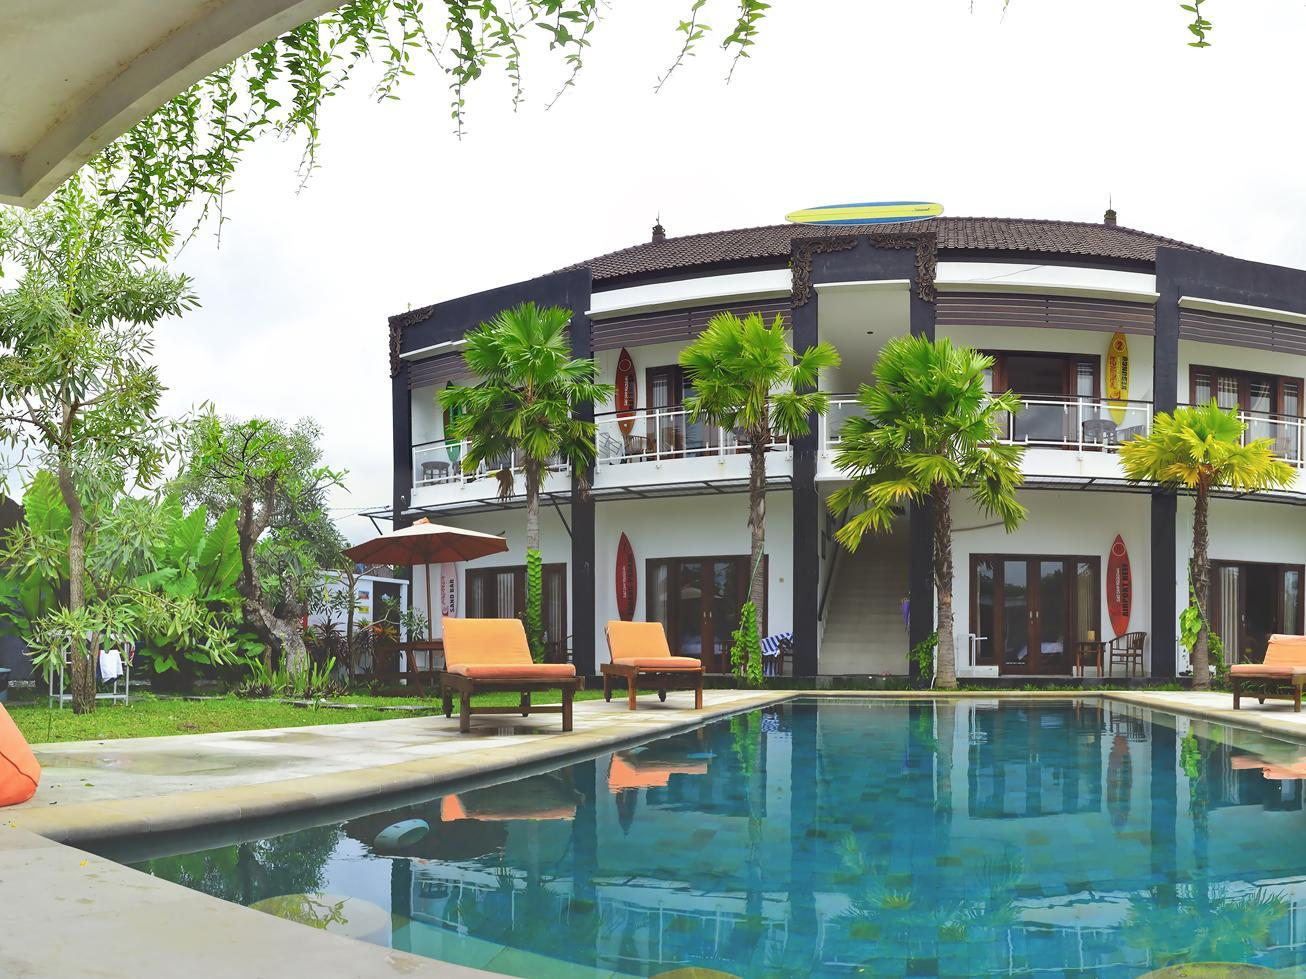 Premier Surf Camp Bali ホテル詳細